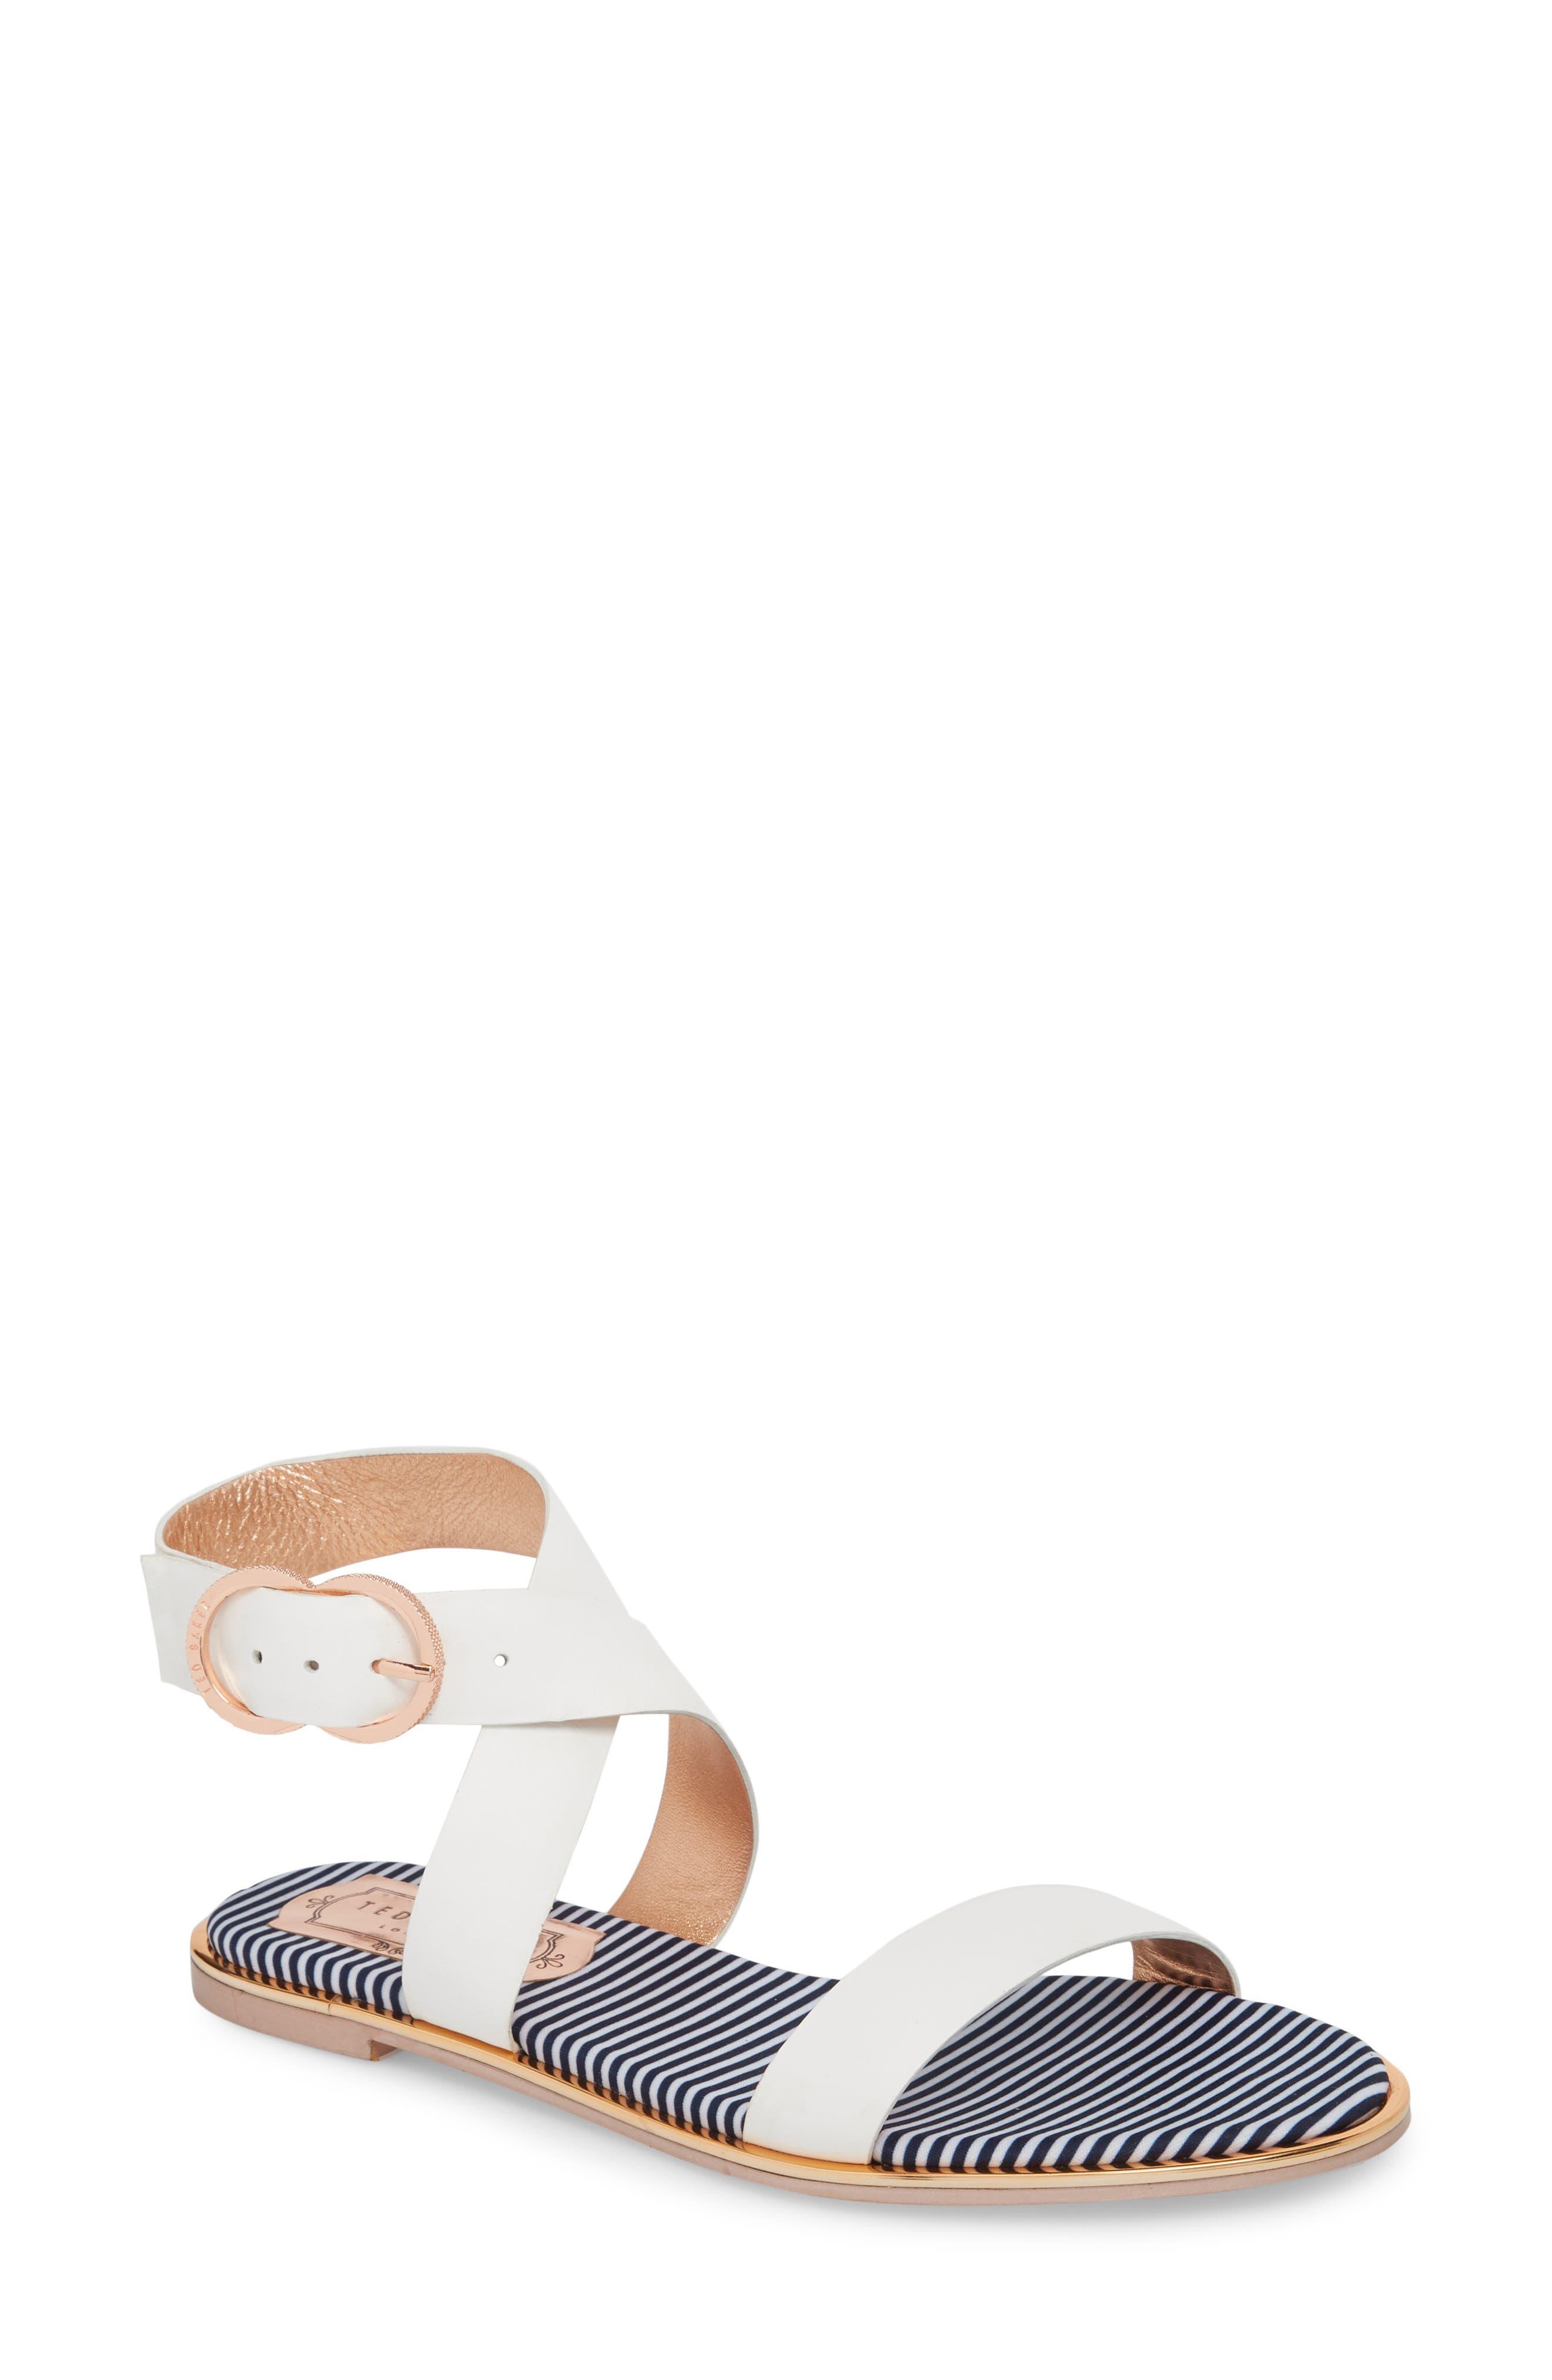 Qereda Sandal,                         Main,                         color, White Leather